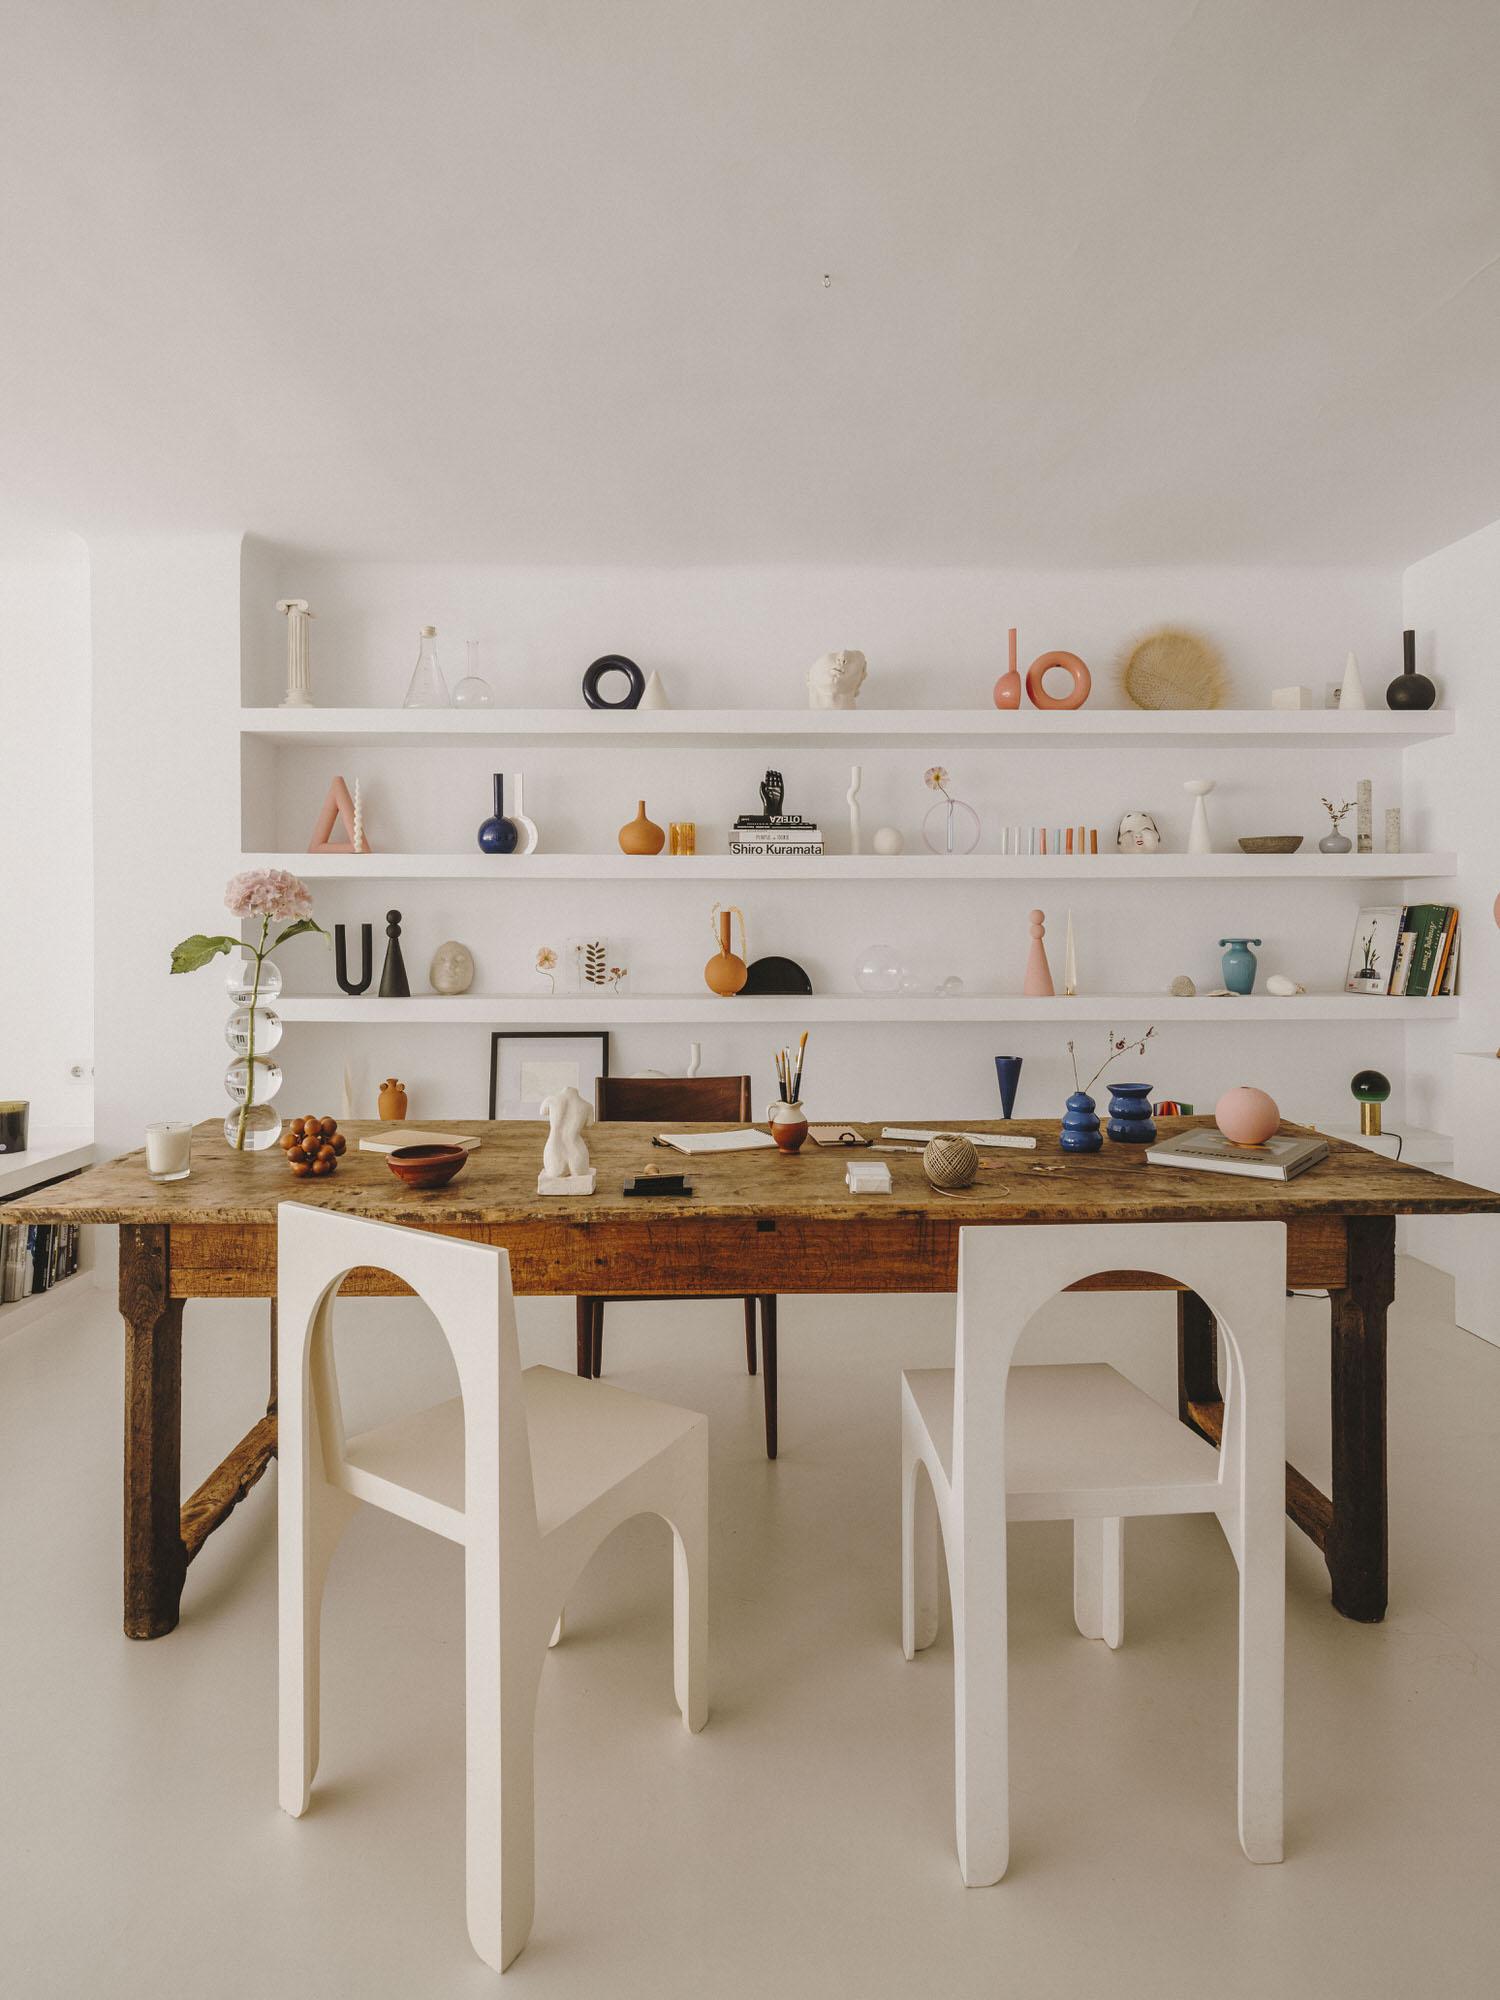 Barcelona Home of Interior Designer Isern Serra & Ceramist Valeria Vasi.